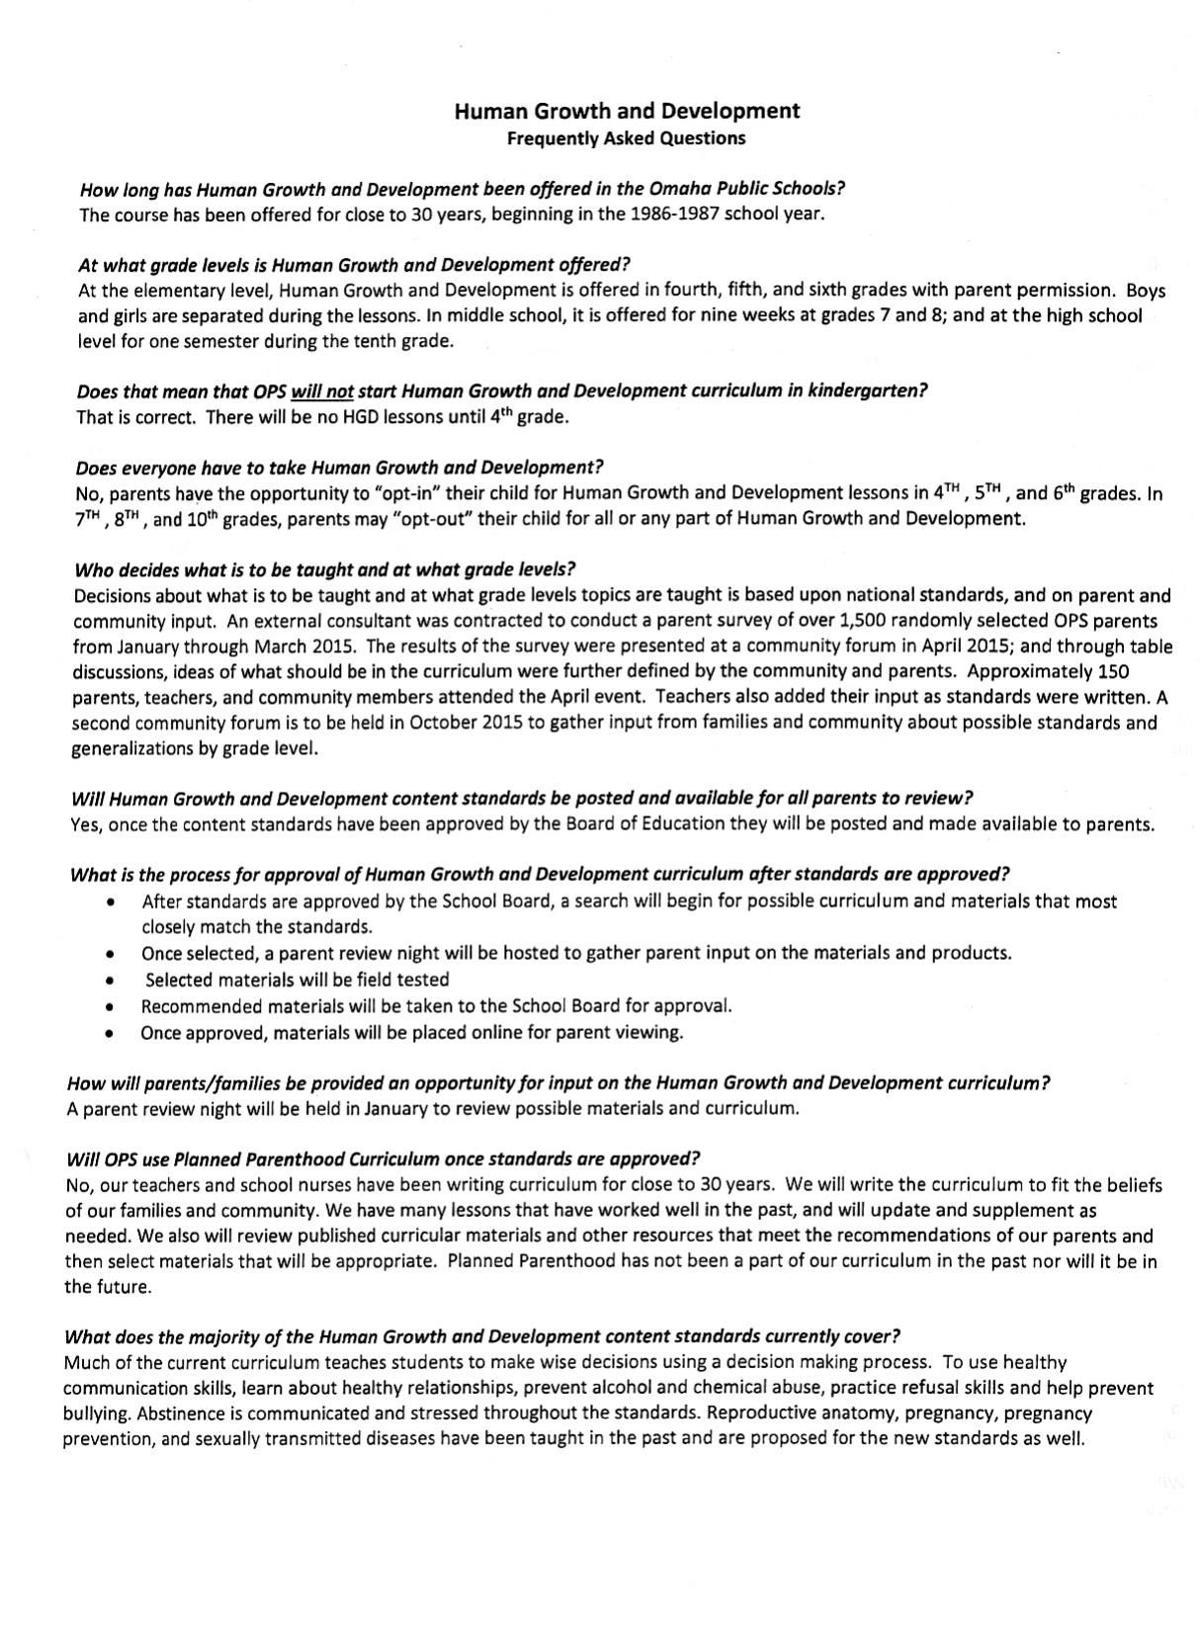 Faq On On Health And Sex Education Pdf Live Well Nebraska